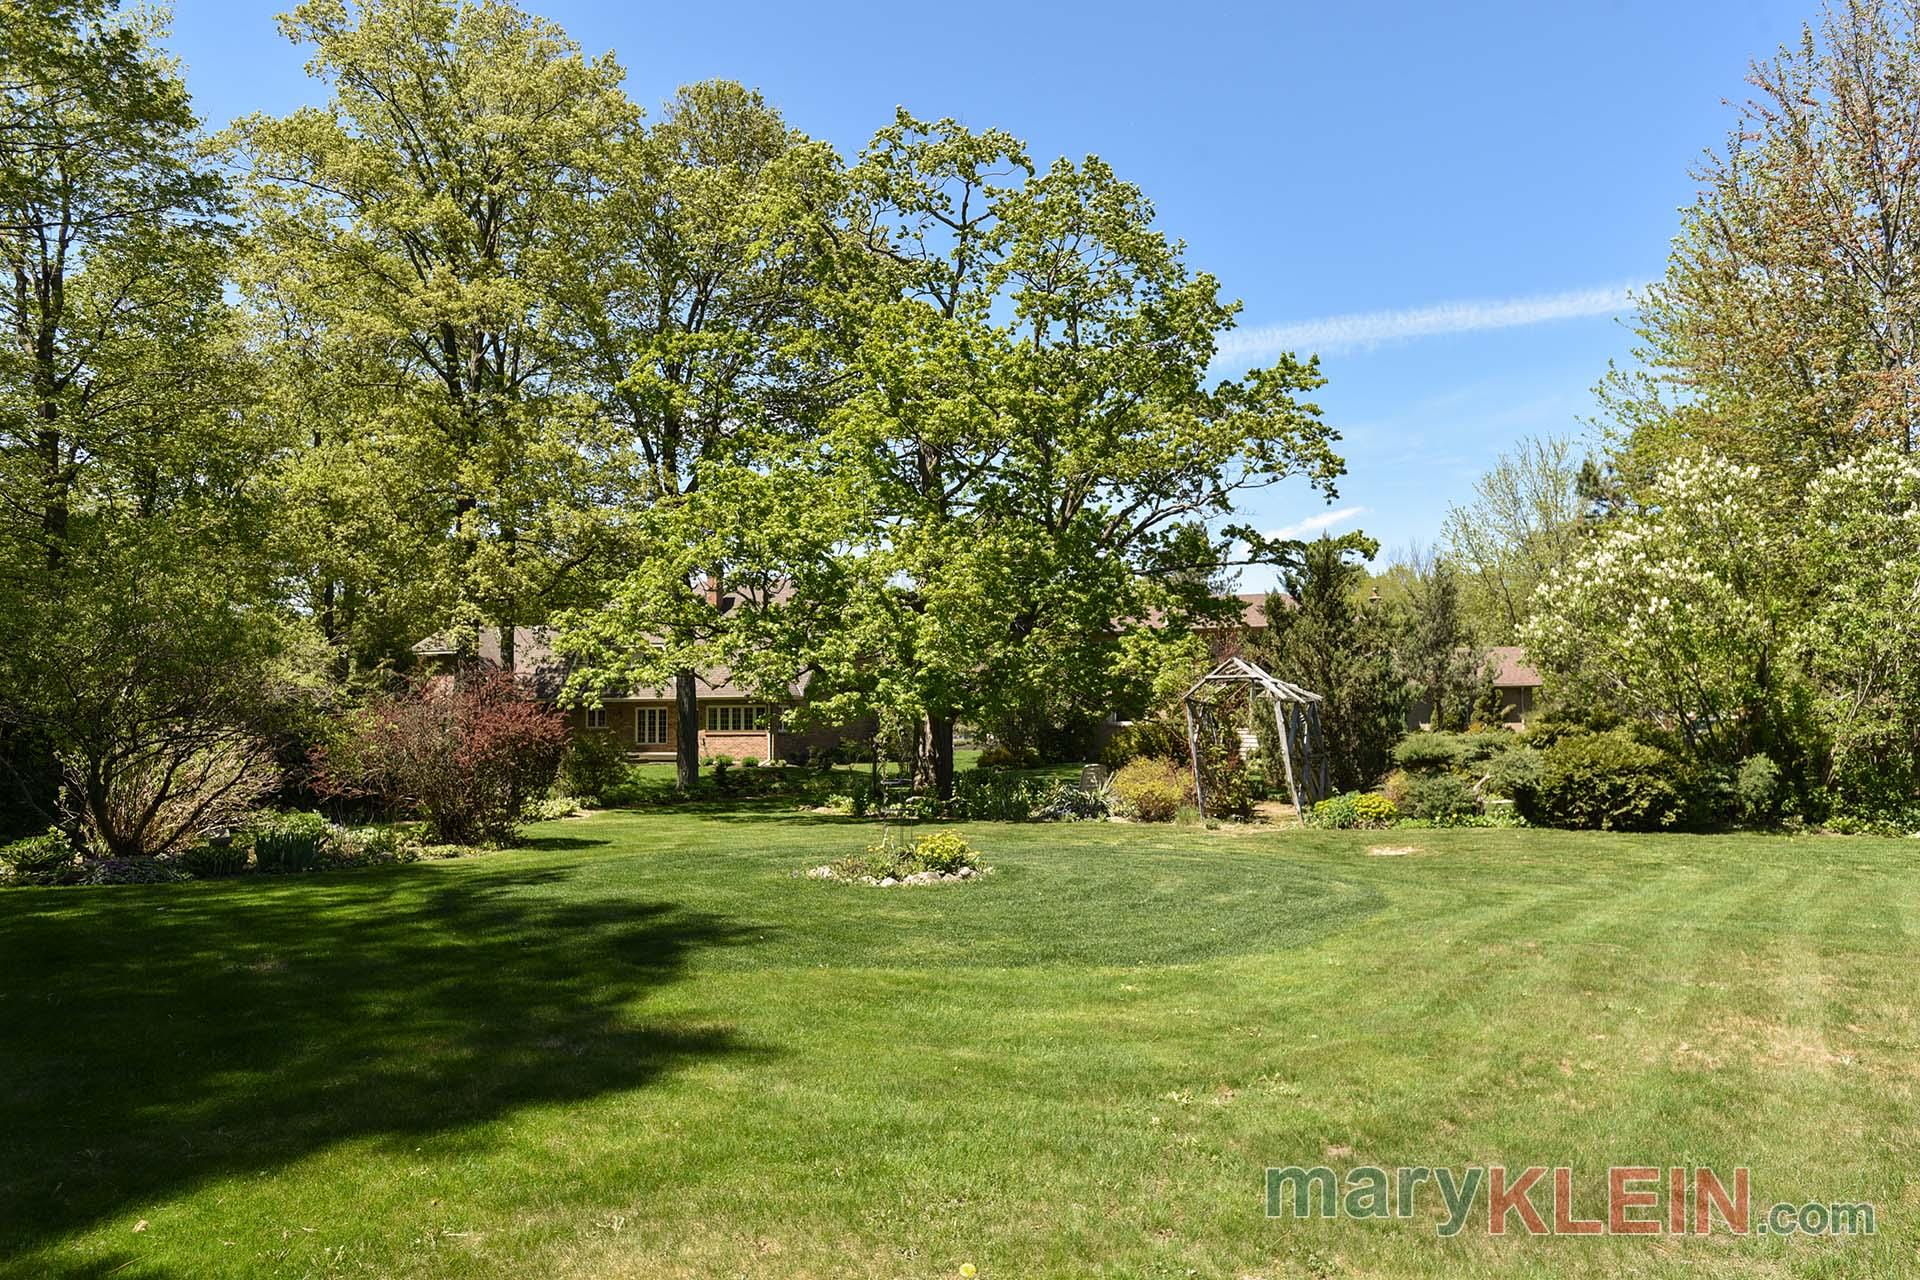 Backyard, Gardens